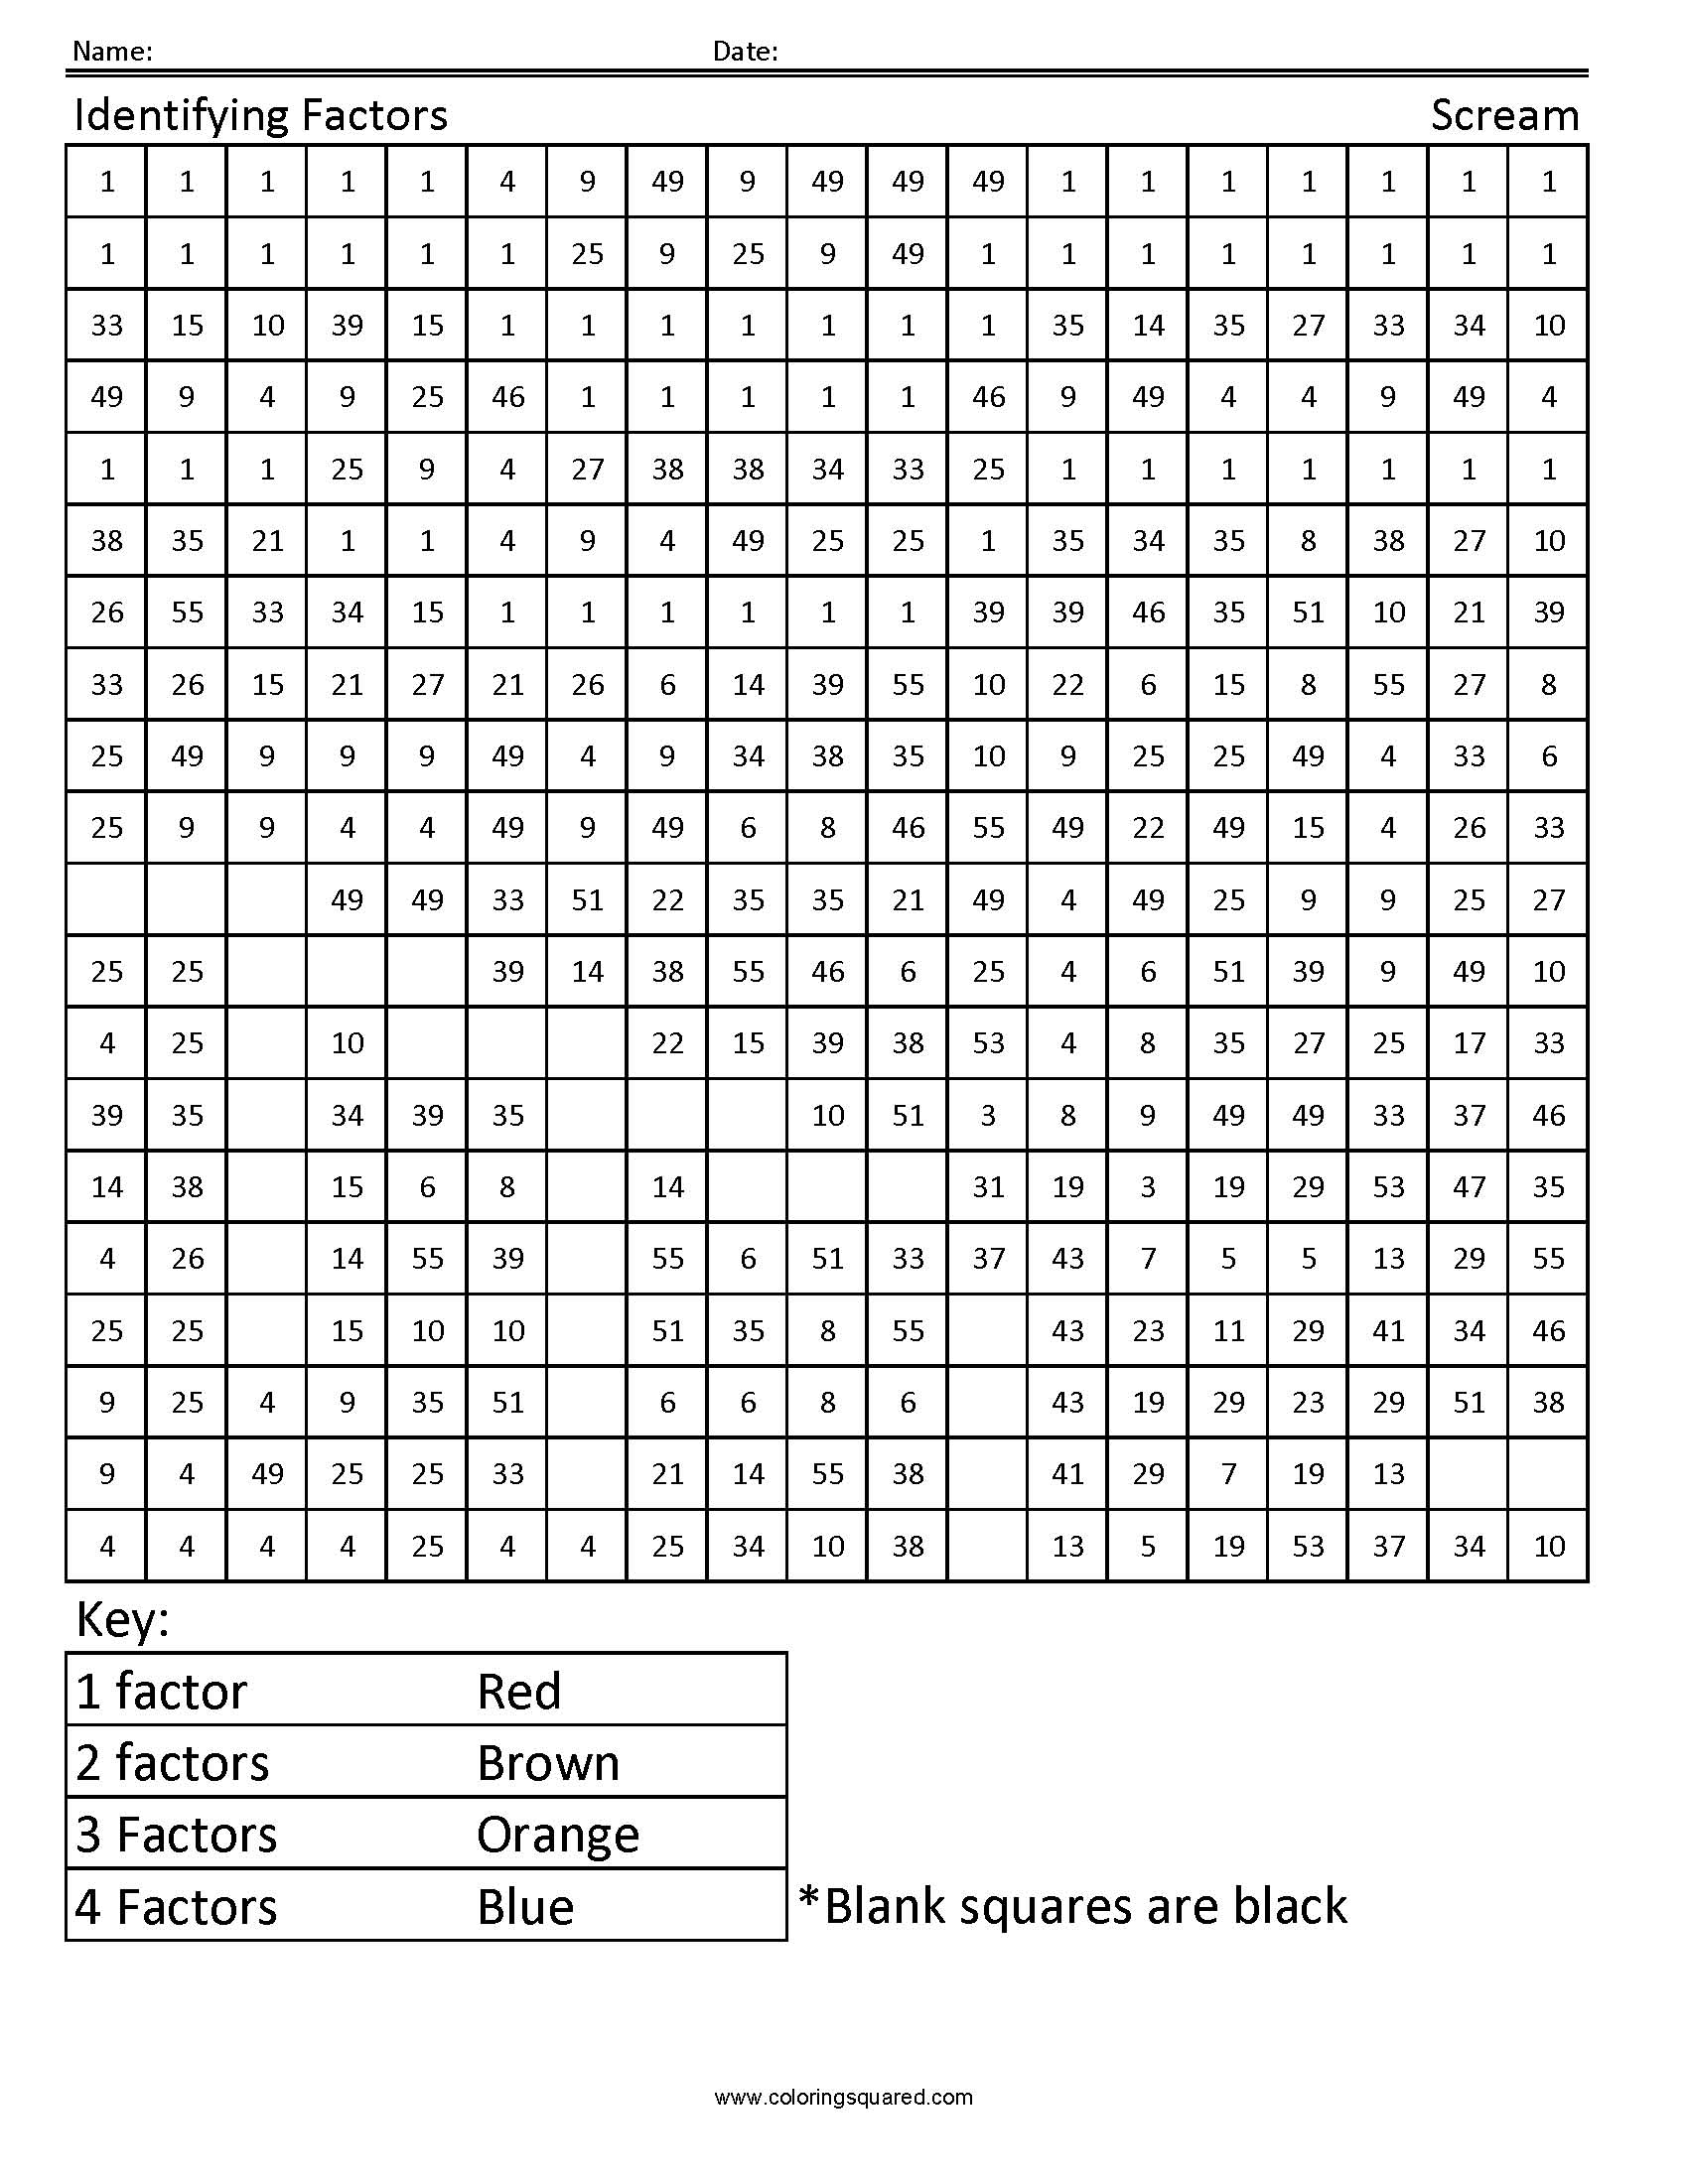 4g24 Factors Scream 4th Grade Math Coloring Squared